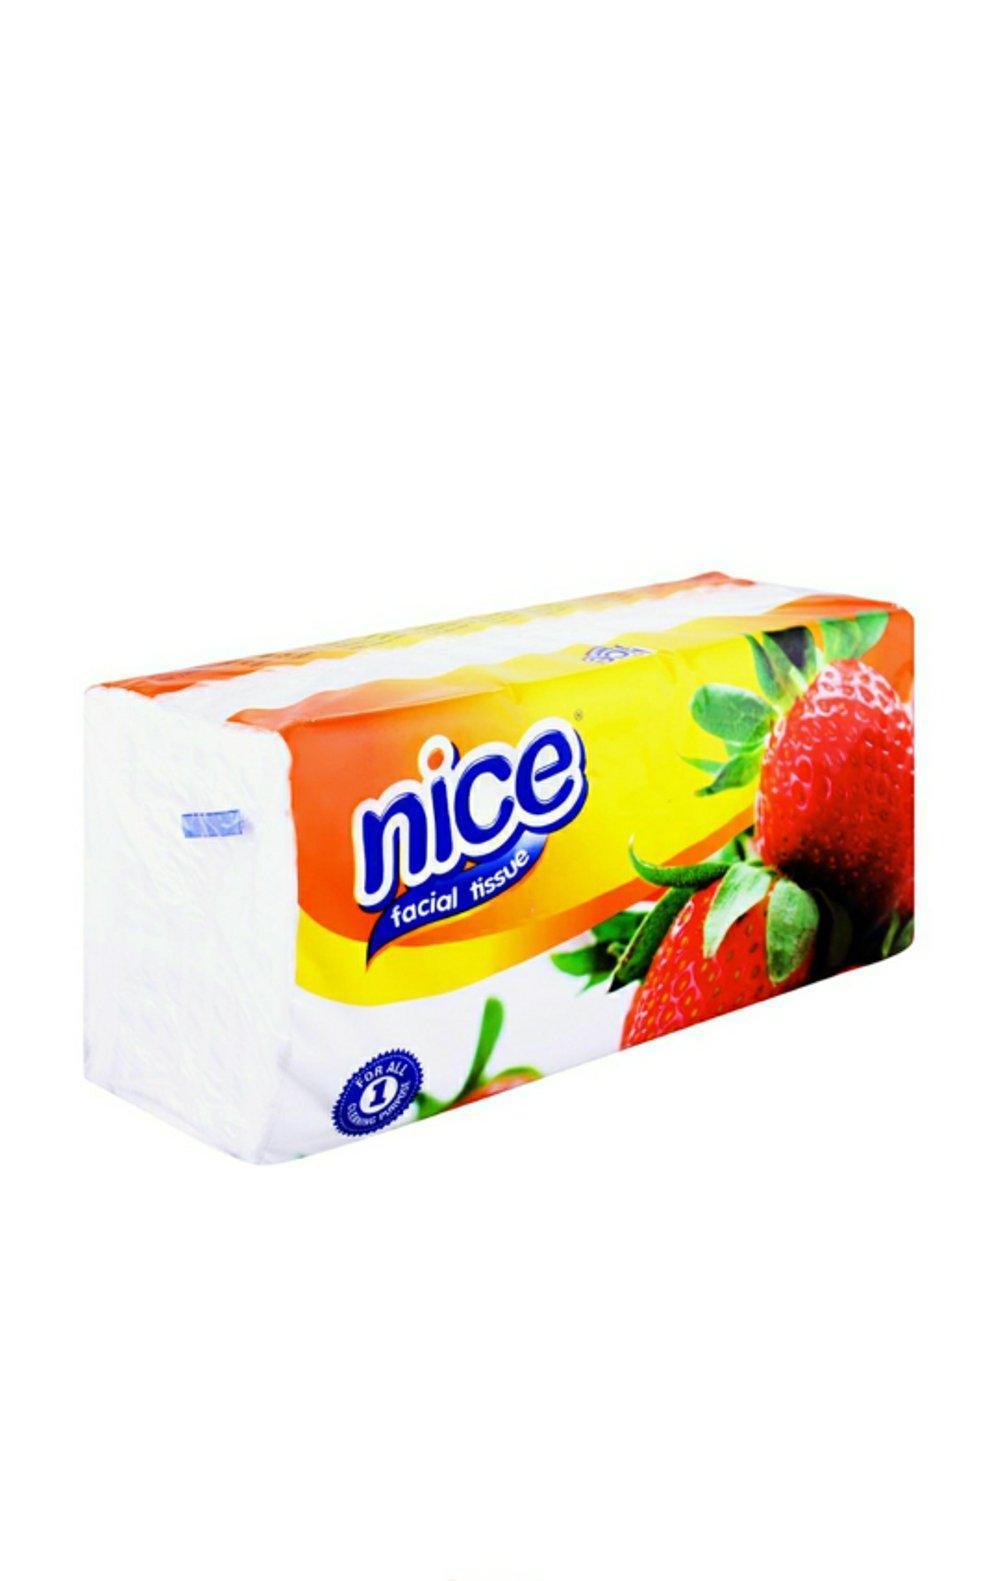 Buy Sell Cheapest Hot Promo Ks114 Best Quality Product Deals Ekstrak Daun Ketapang Merah 100ml Indian Almond Premium Nice Facial Soft Pack 200 S Tissue Tisue Tisu Wajah